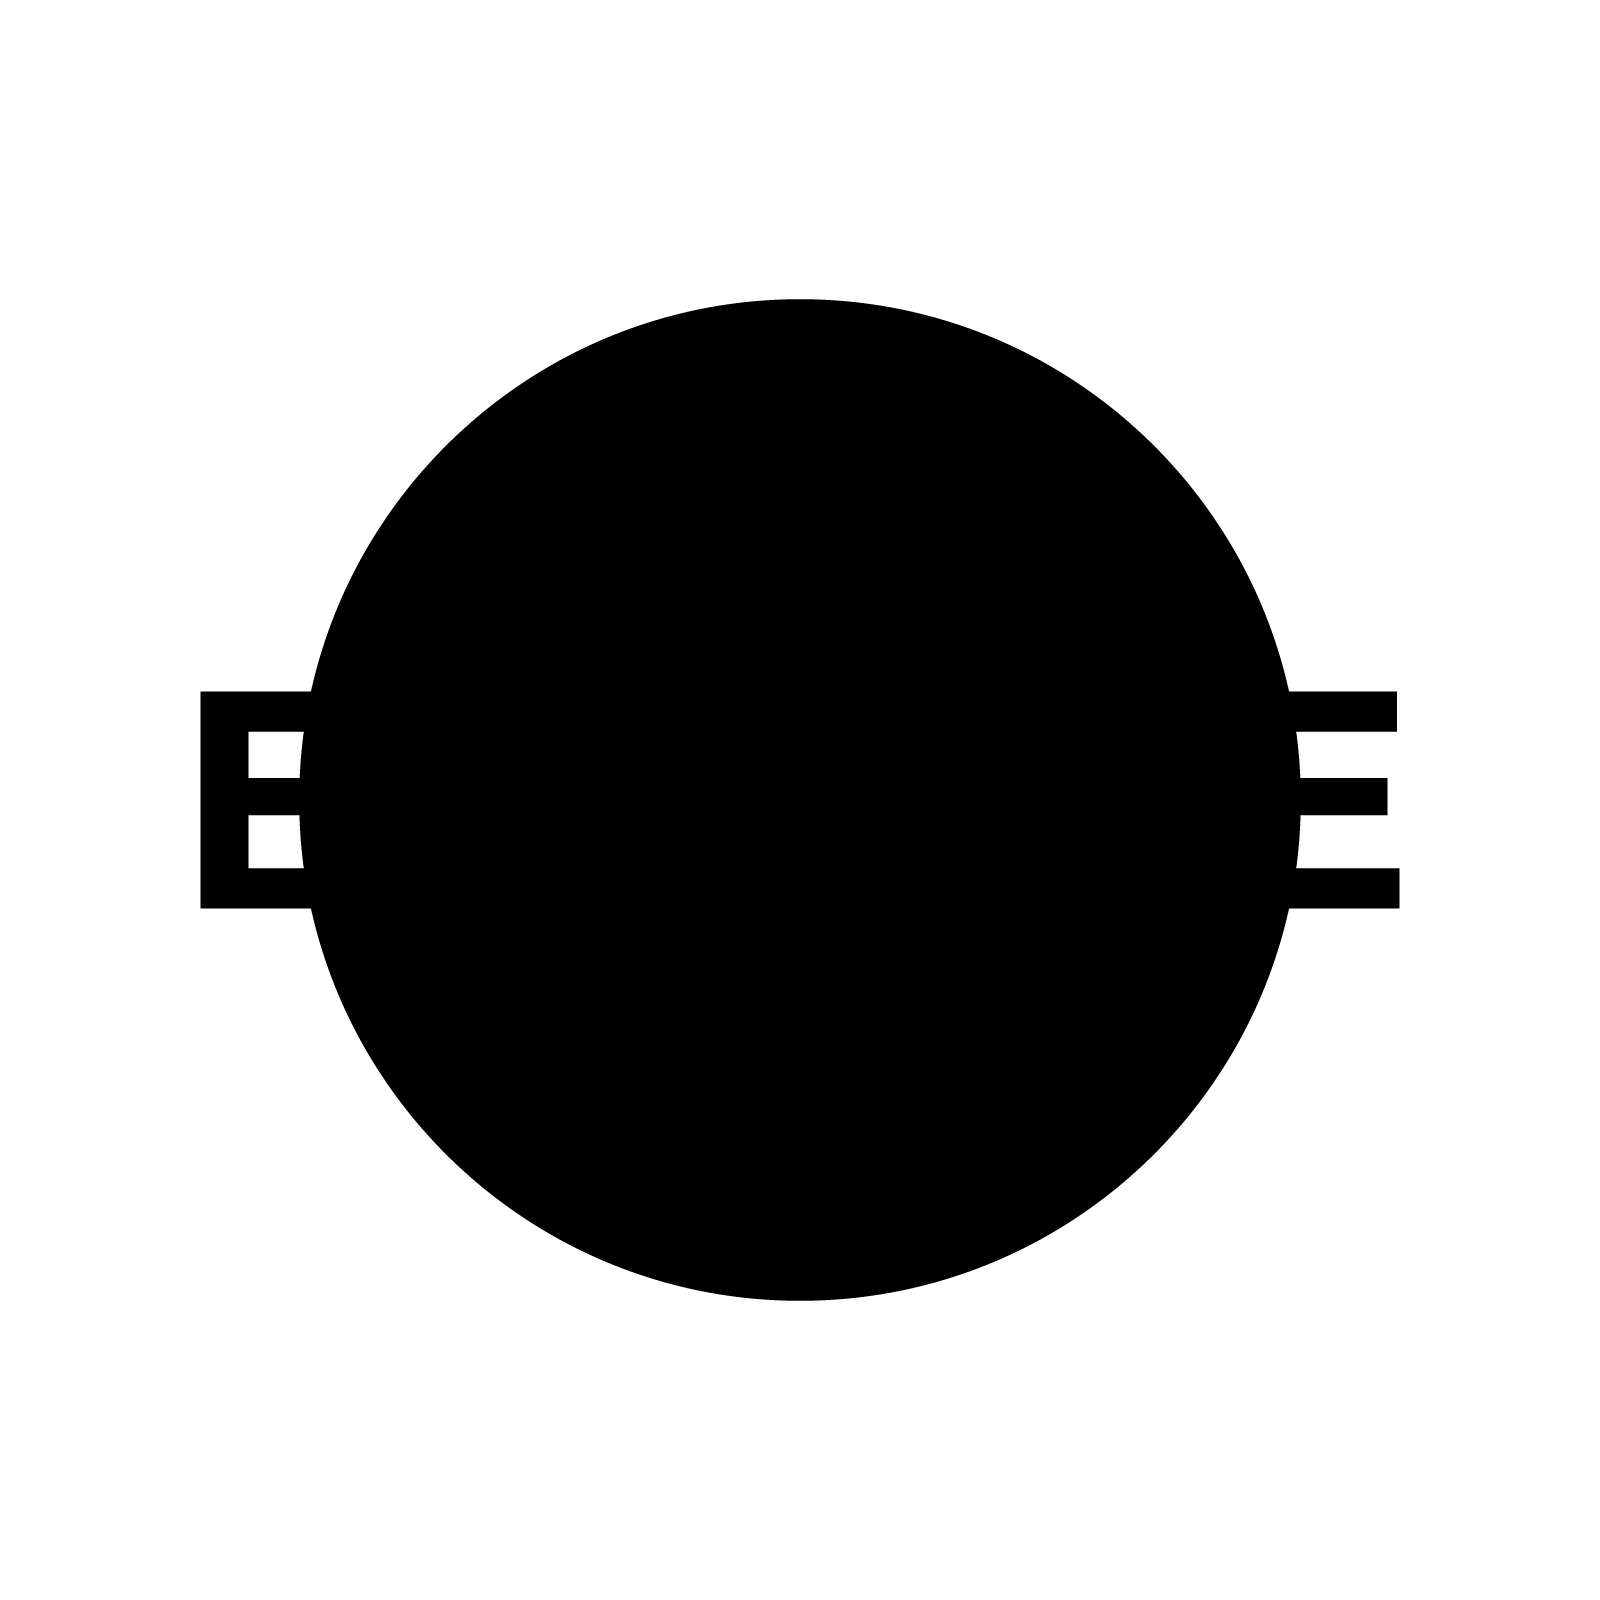 Celebrating the solar eclipse of 2017.